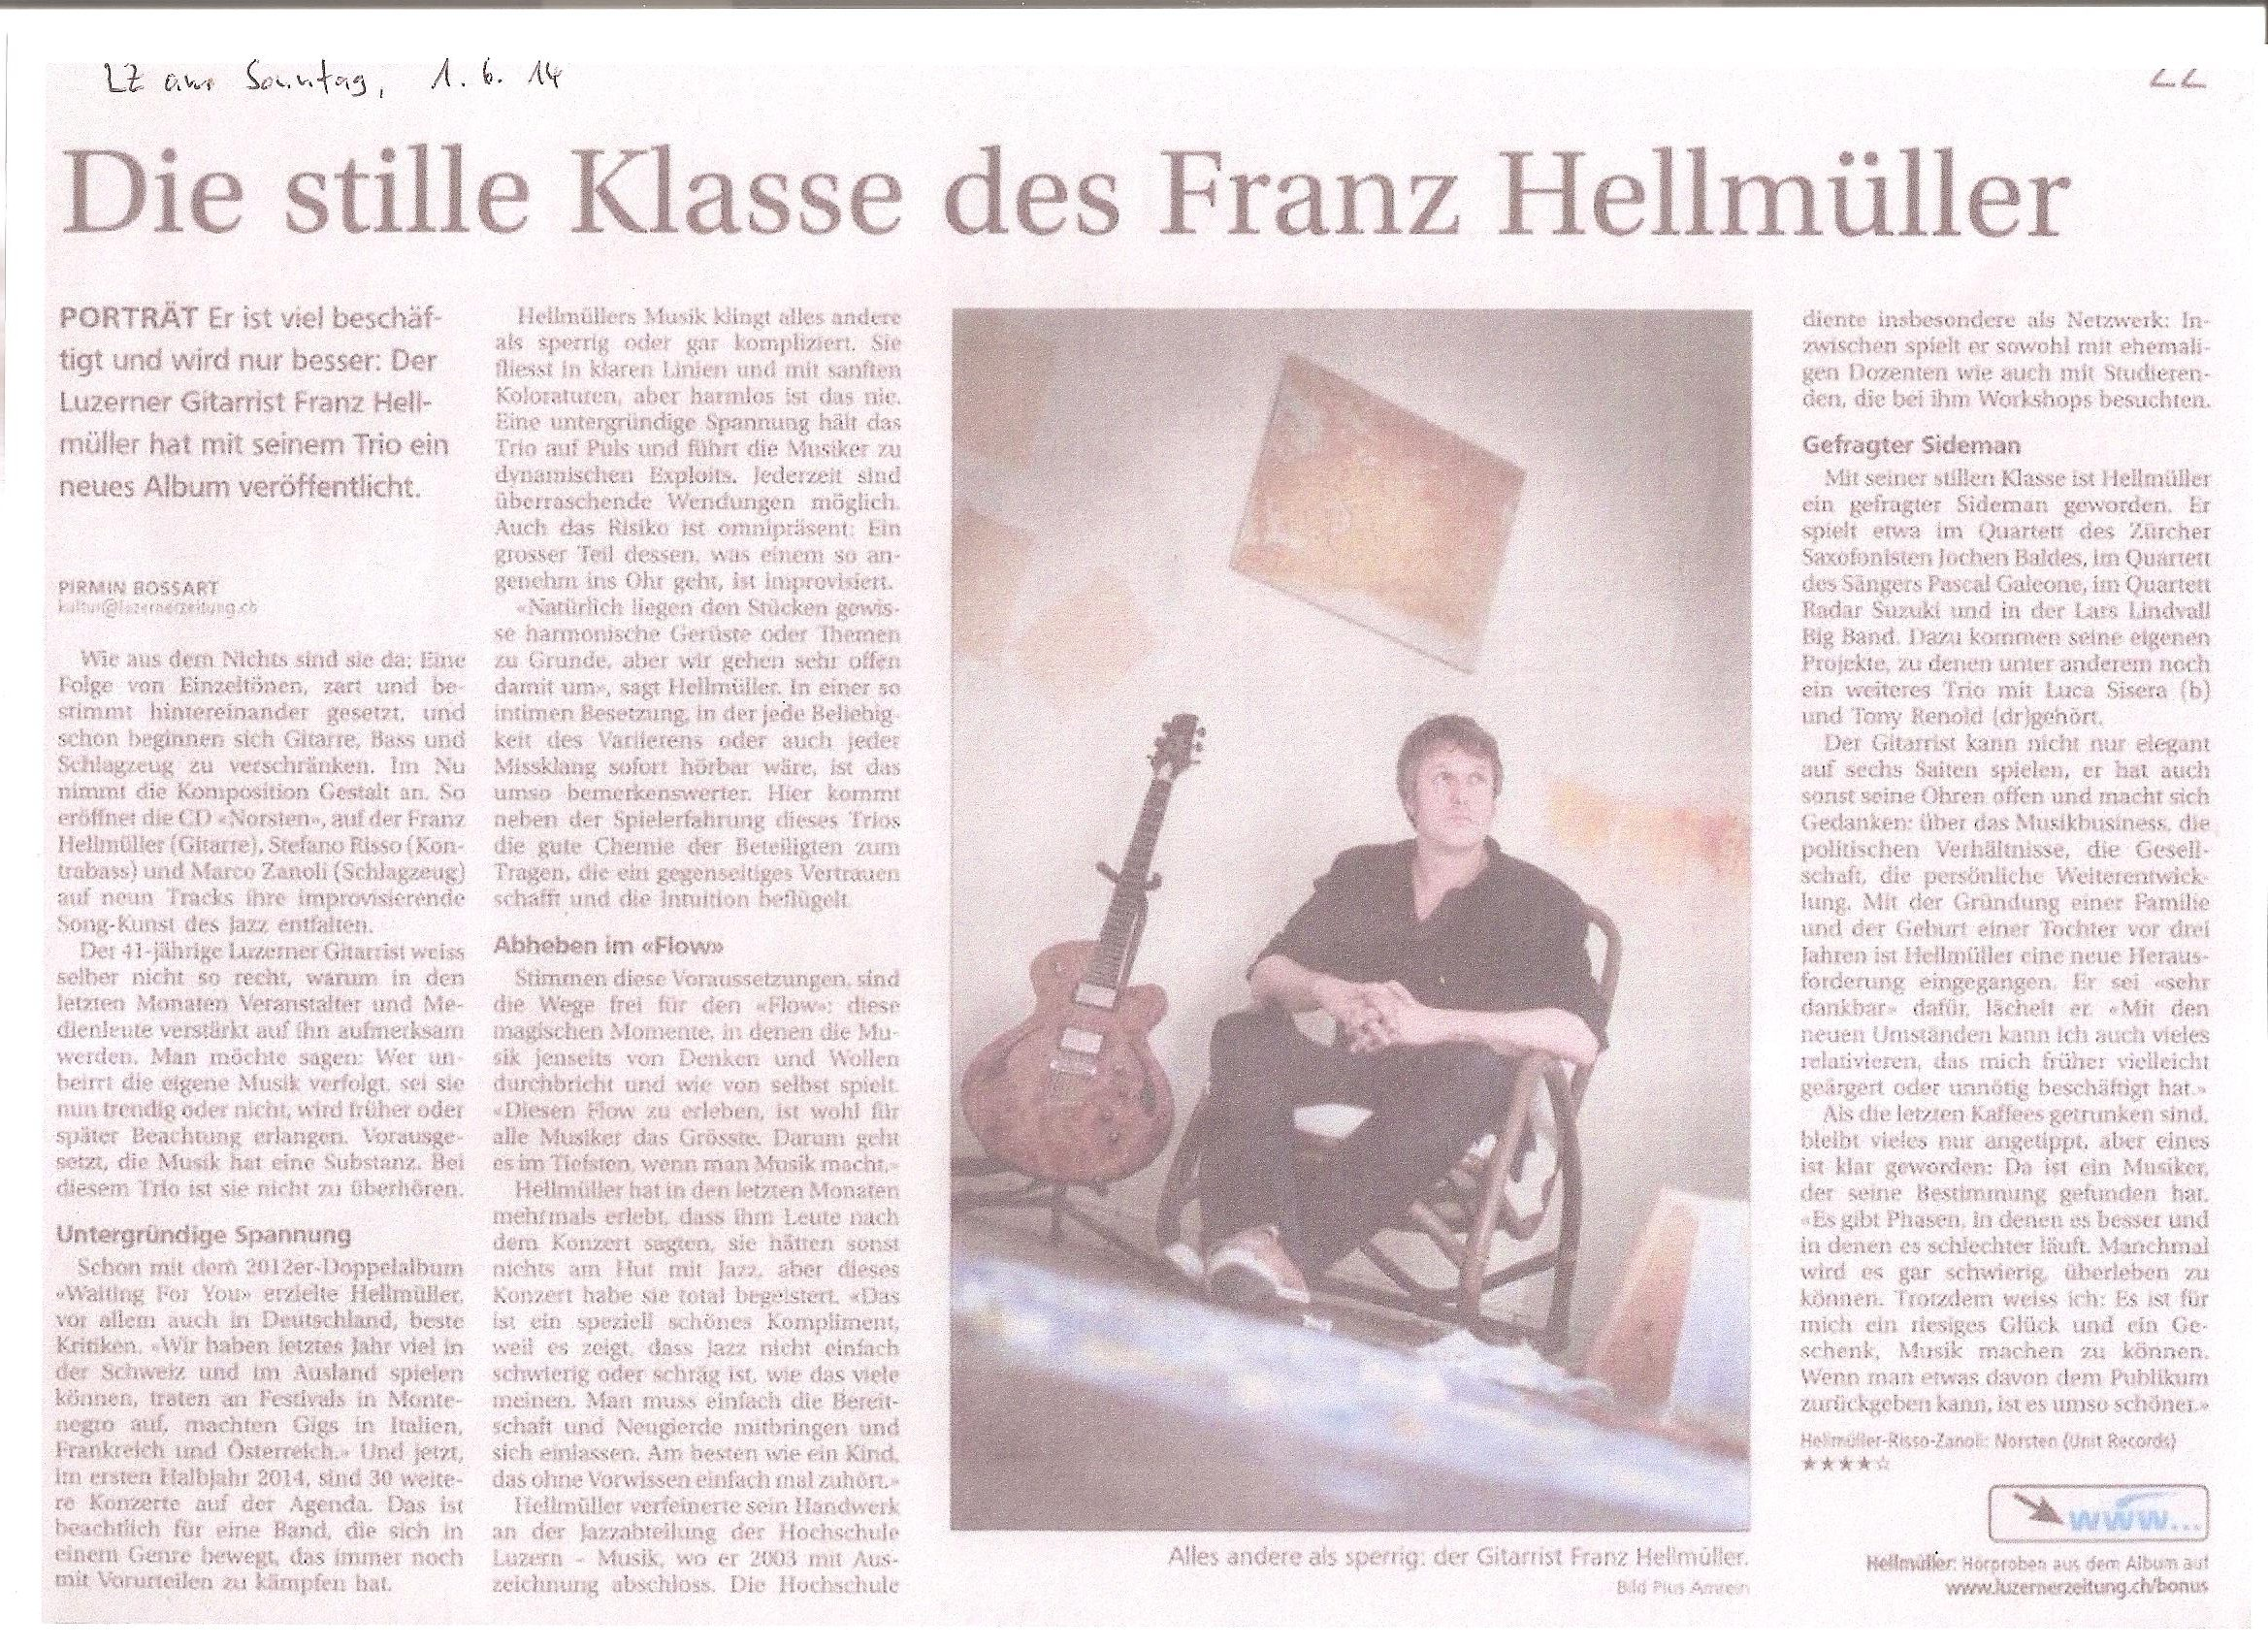 Hellmüller LZ am Sonntag, 1.6.14 001